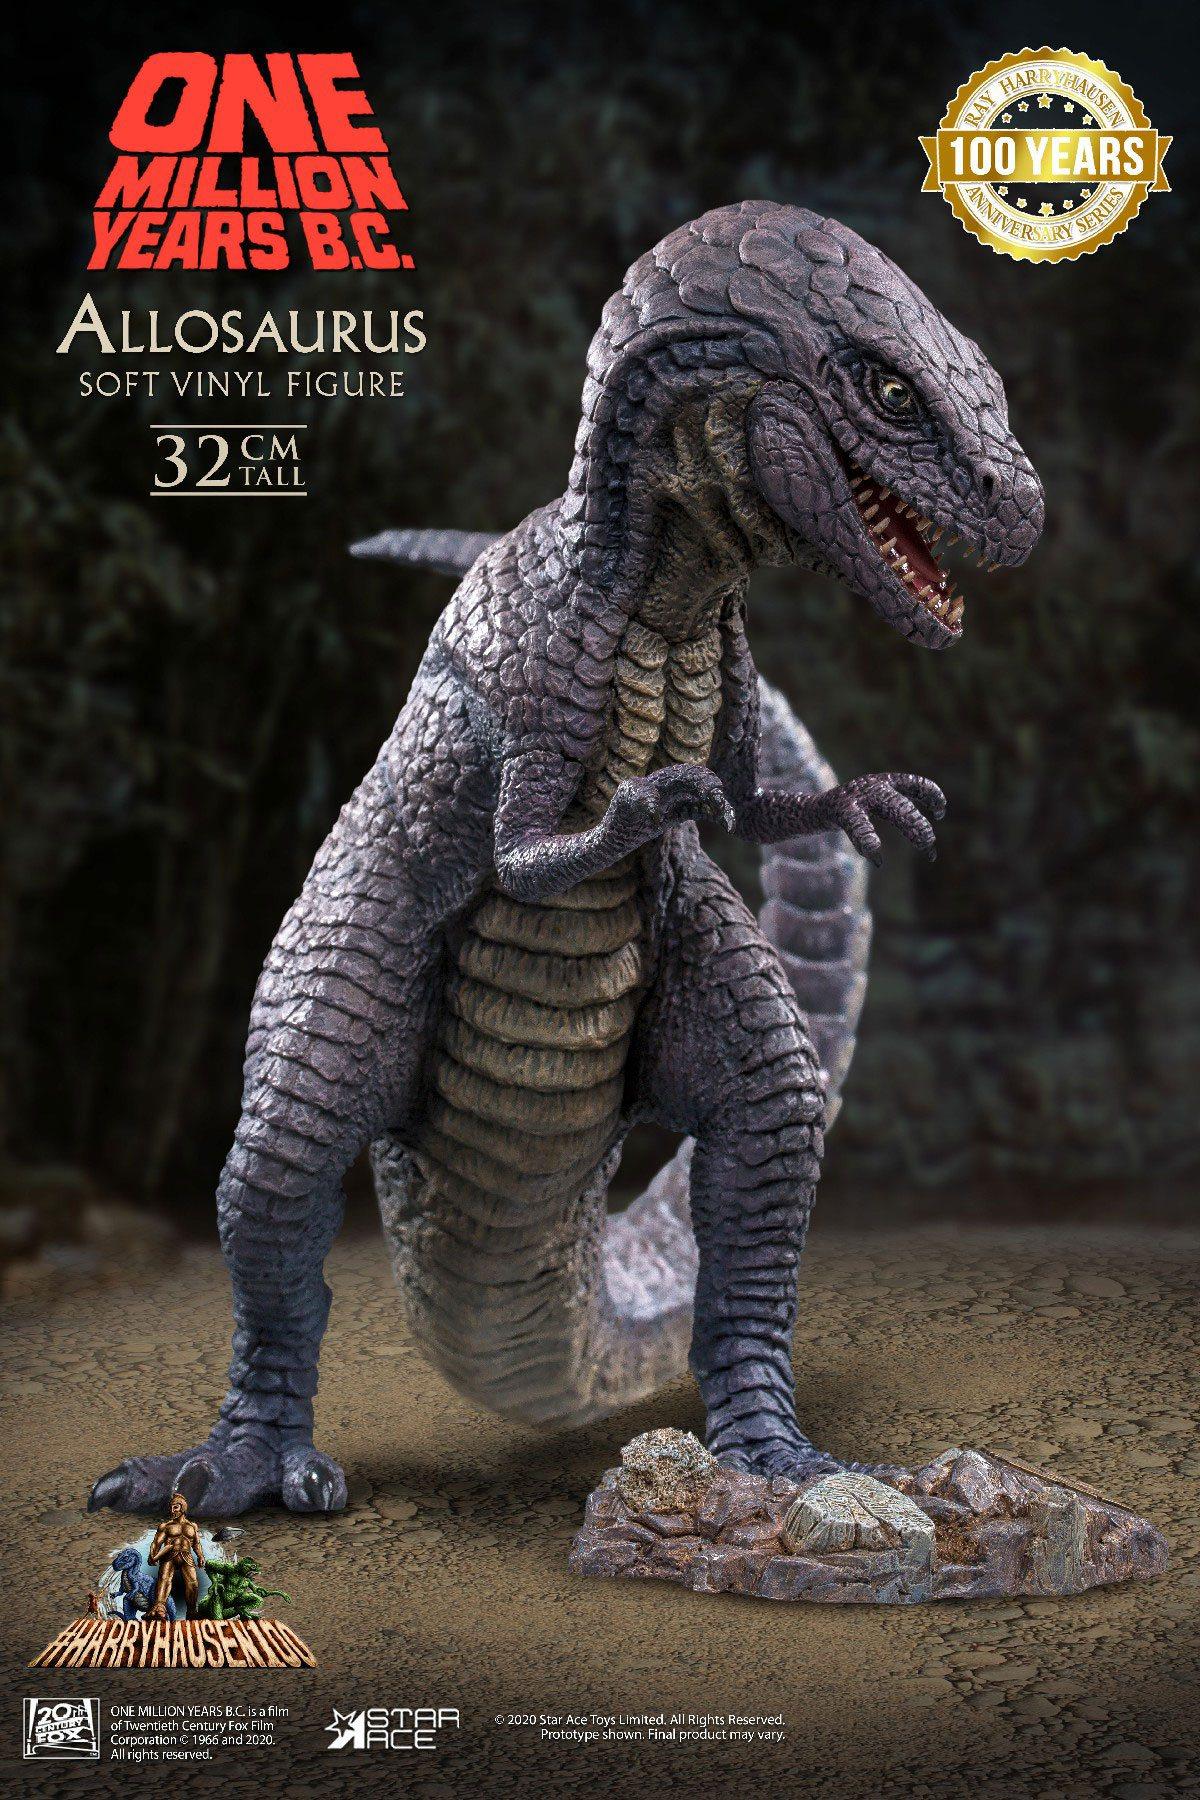 One Million Years B.C. Soft Vinyl Statue Allosaurus 32 cm